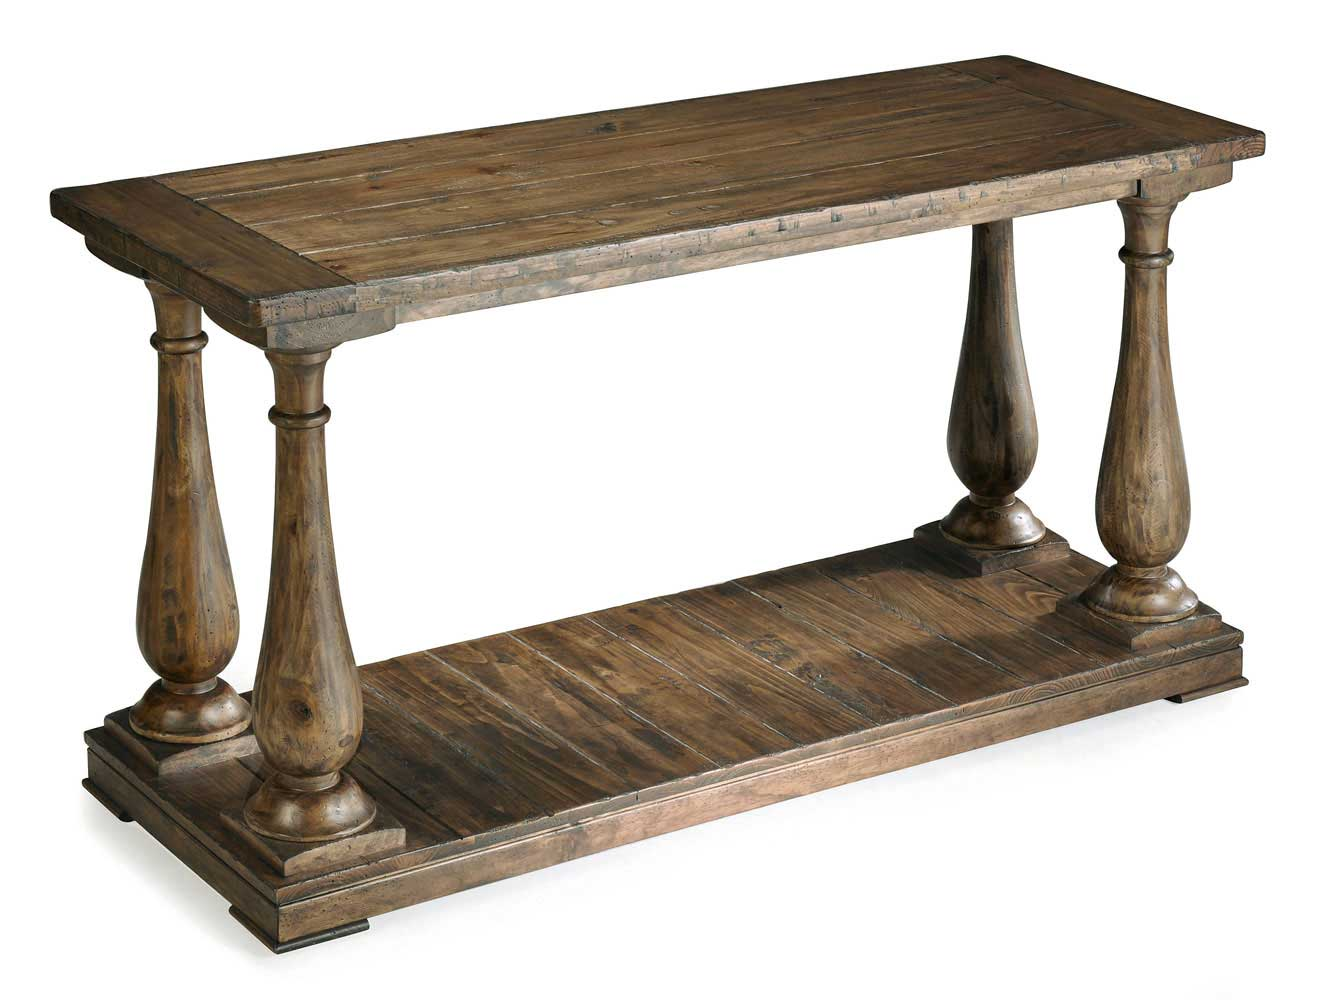 Sofa Console Table : Densbury Rectangular Sofa Table (Natural Pine) - [T1695-73] : Decor ...